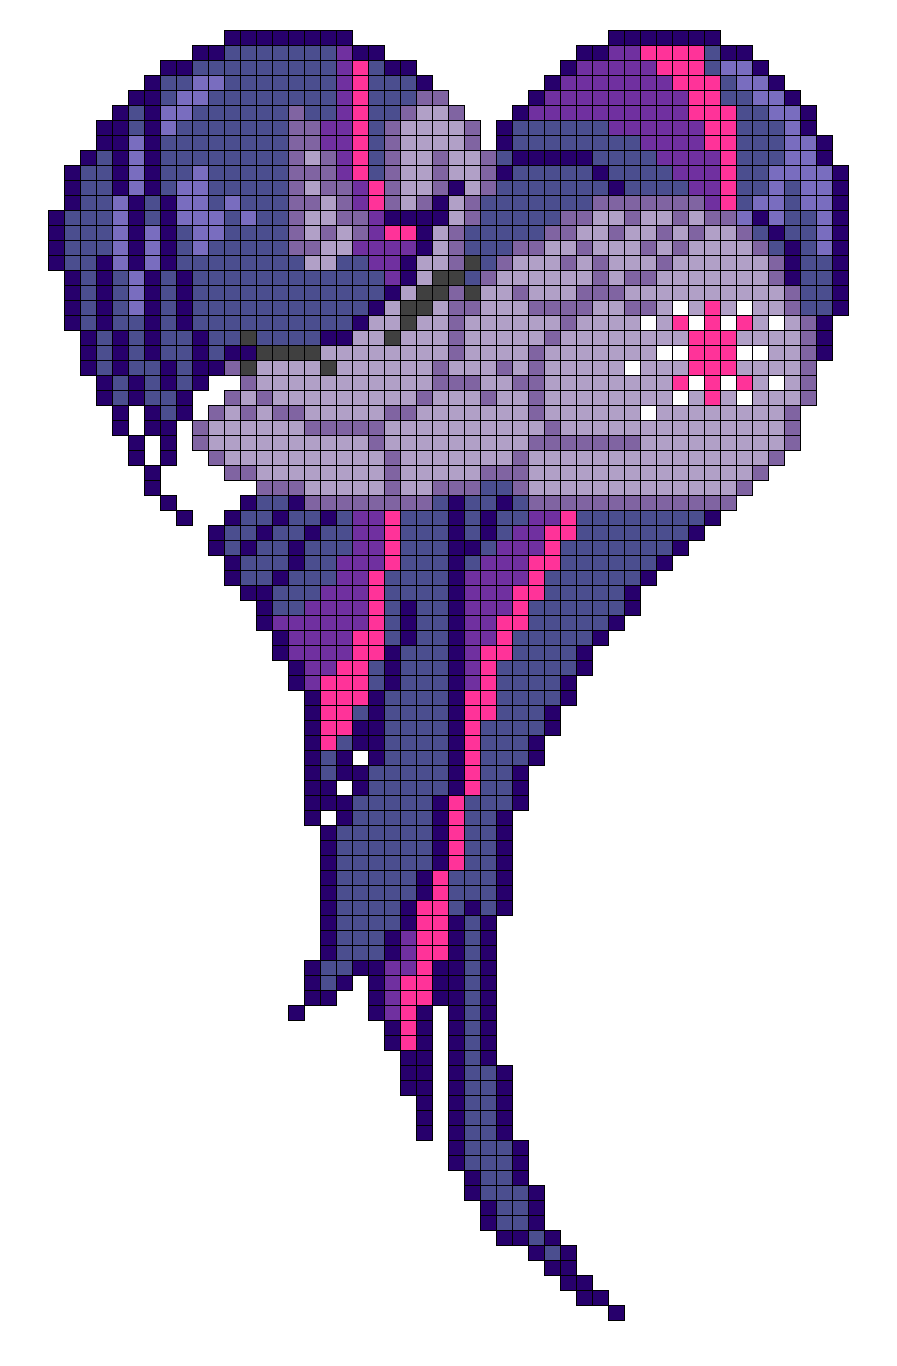 MLP Princess Twilight Sparkle heart perler bead pattern by